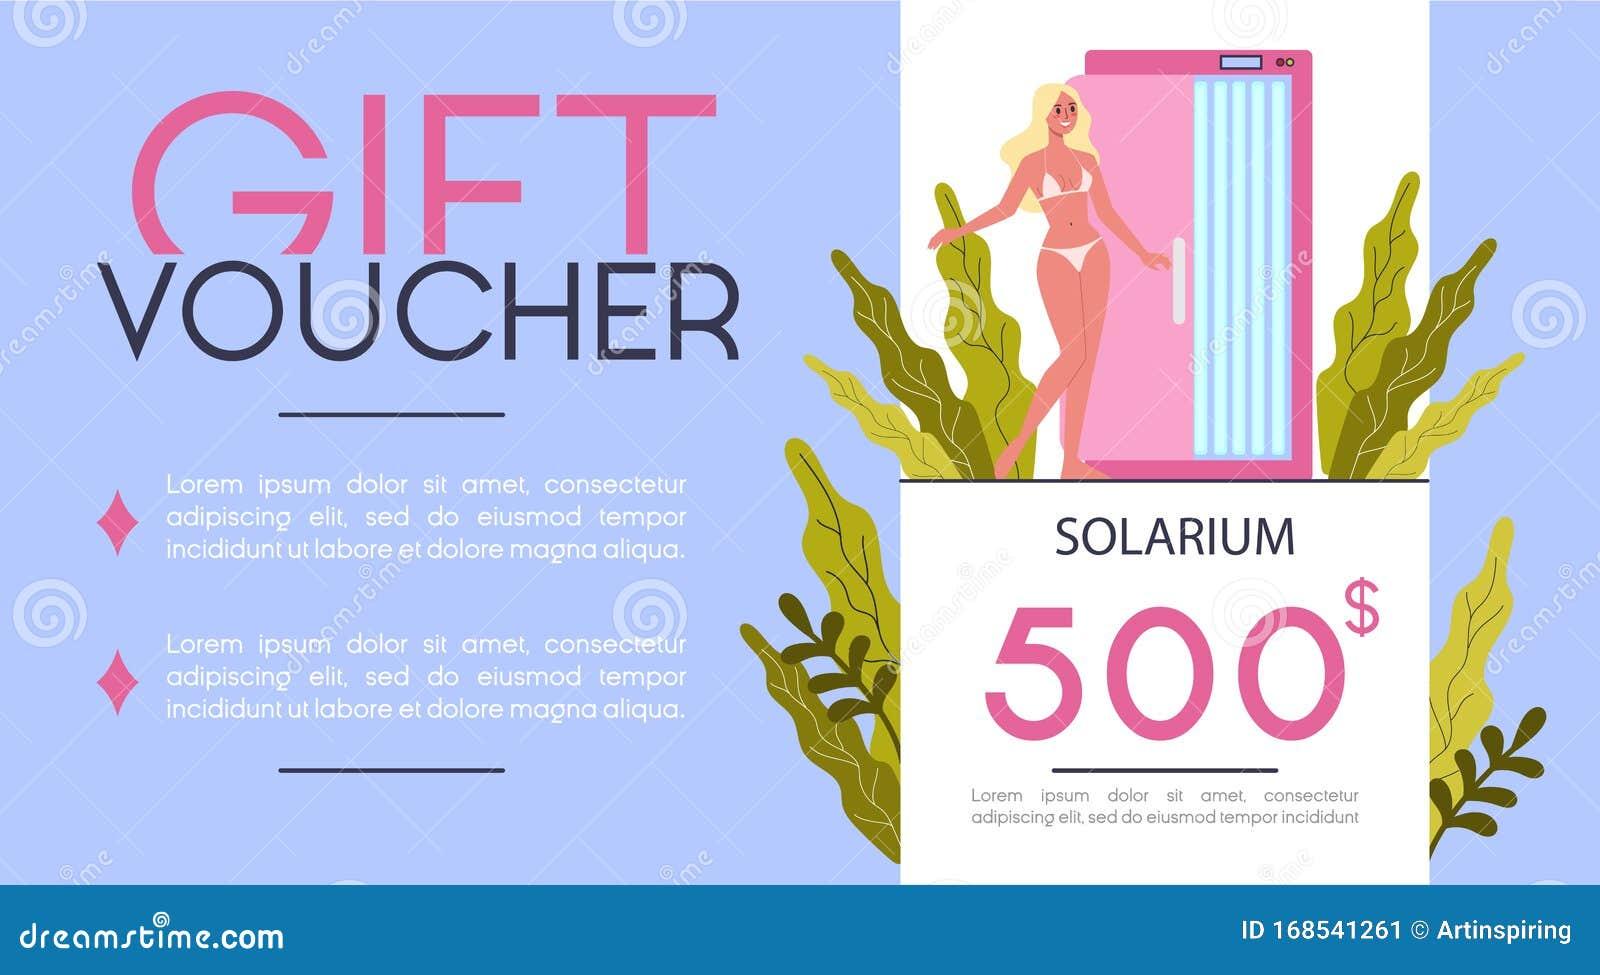 Gift Voucher For Beauty Center Concept Beauty Salon Voucher For Procedure Stock Vector Illustration Of Cartoon Design 168541261